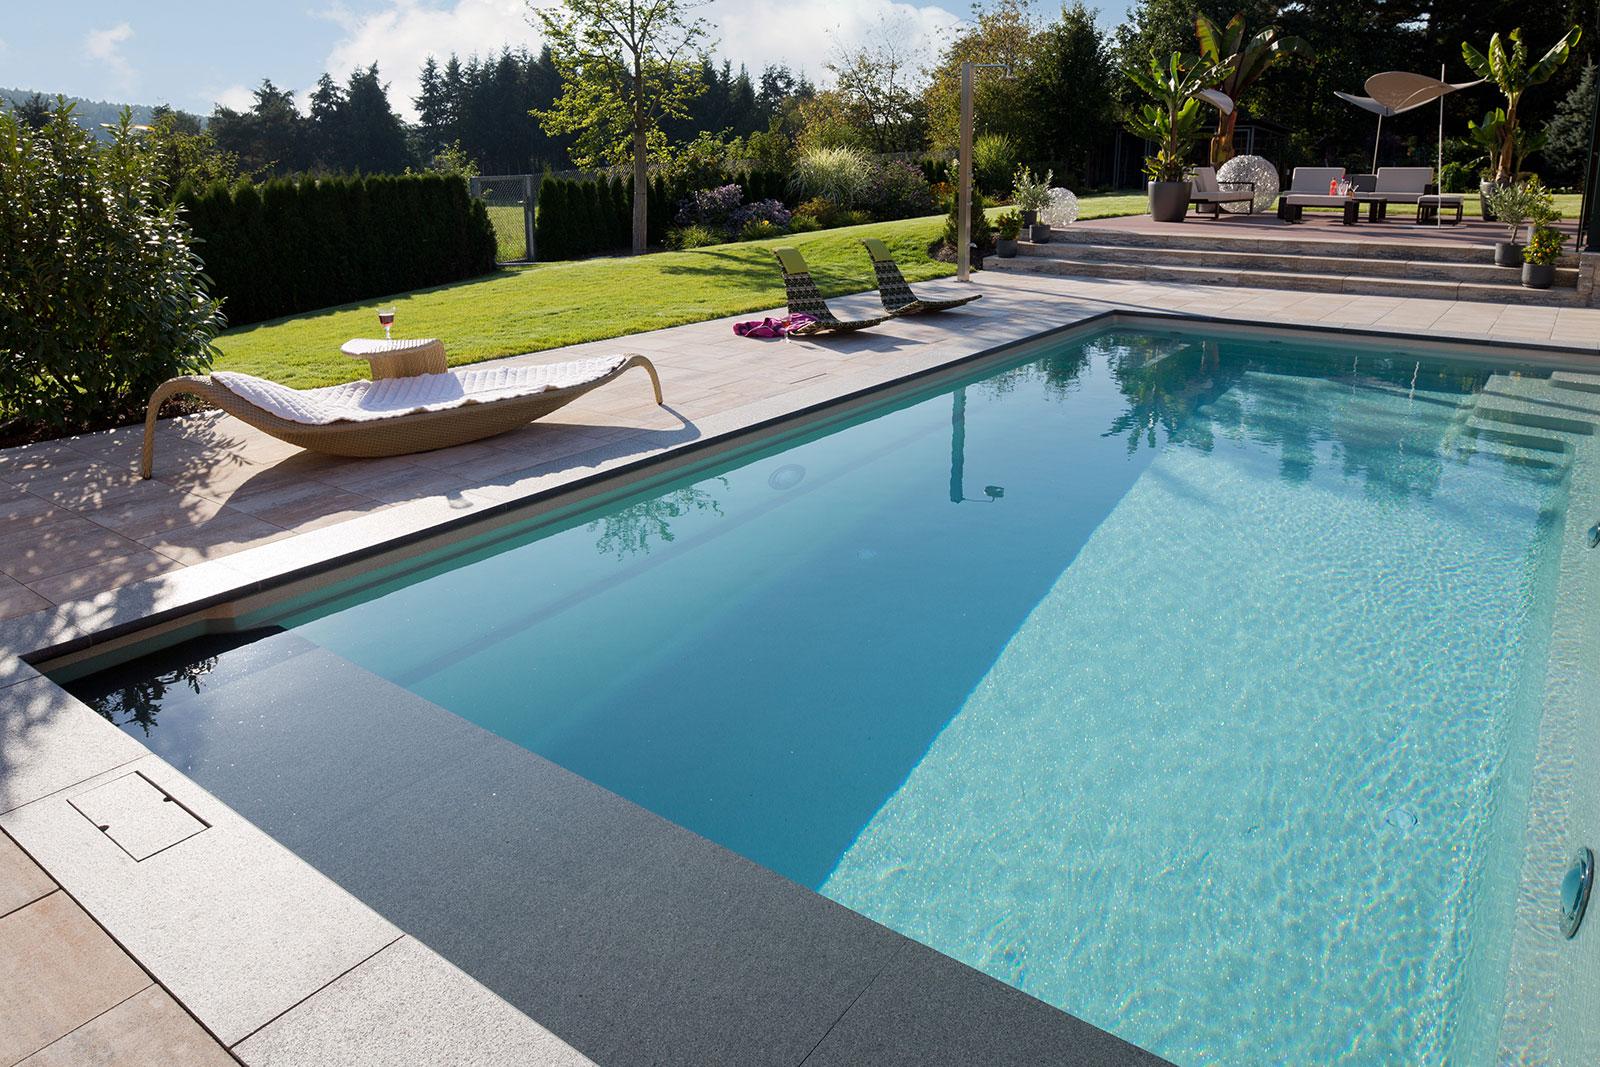 Trainer serie reps gmbh schwimmbad whirlpool for Fertigbecken pool